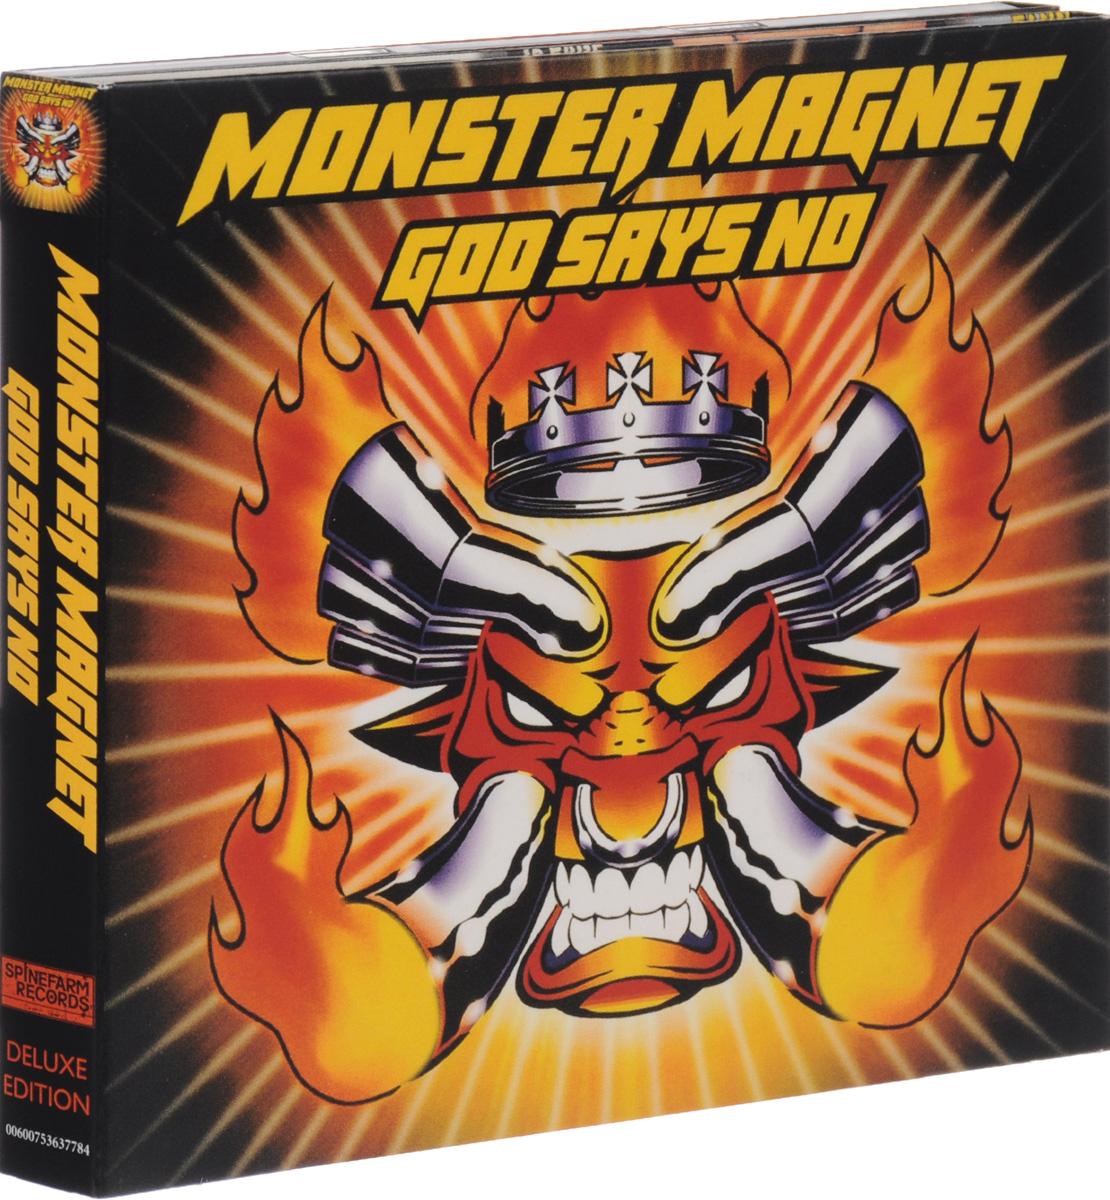 """Monster Magnet"" Monster Magnet. God Says No. Deluxe Edition (2 CD)"